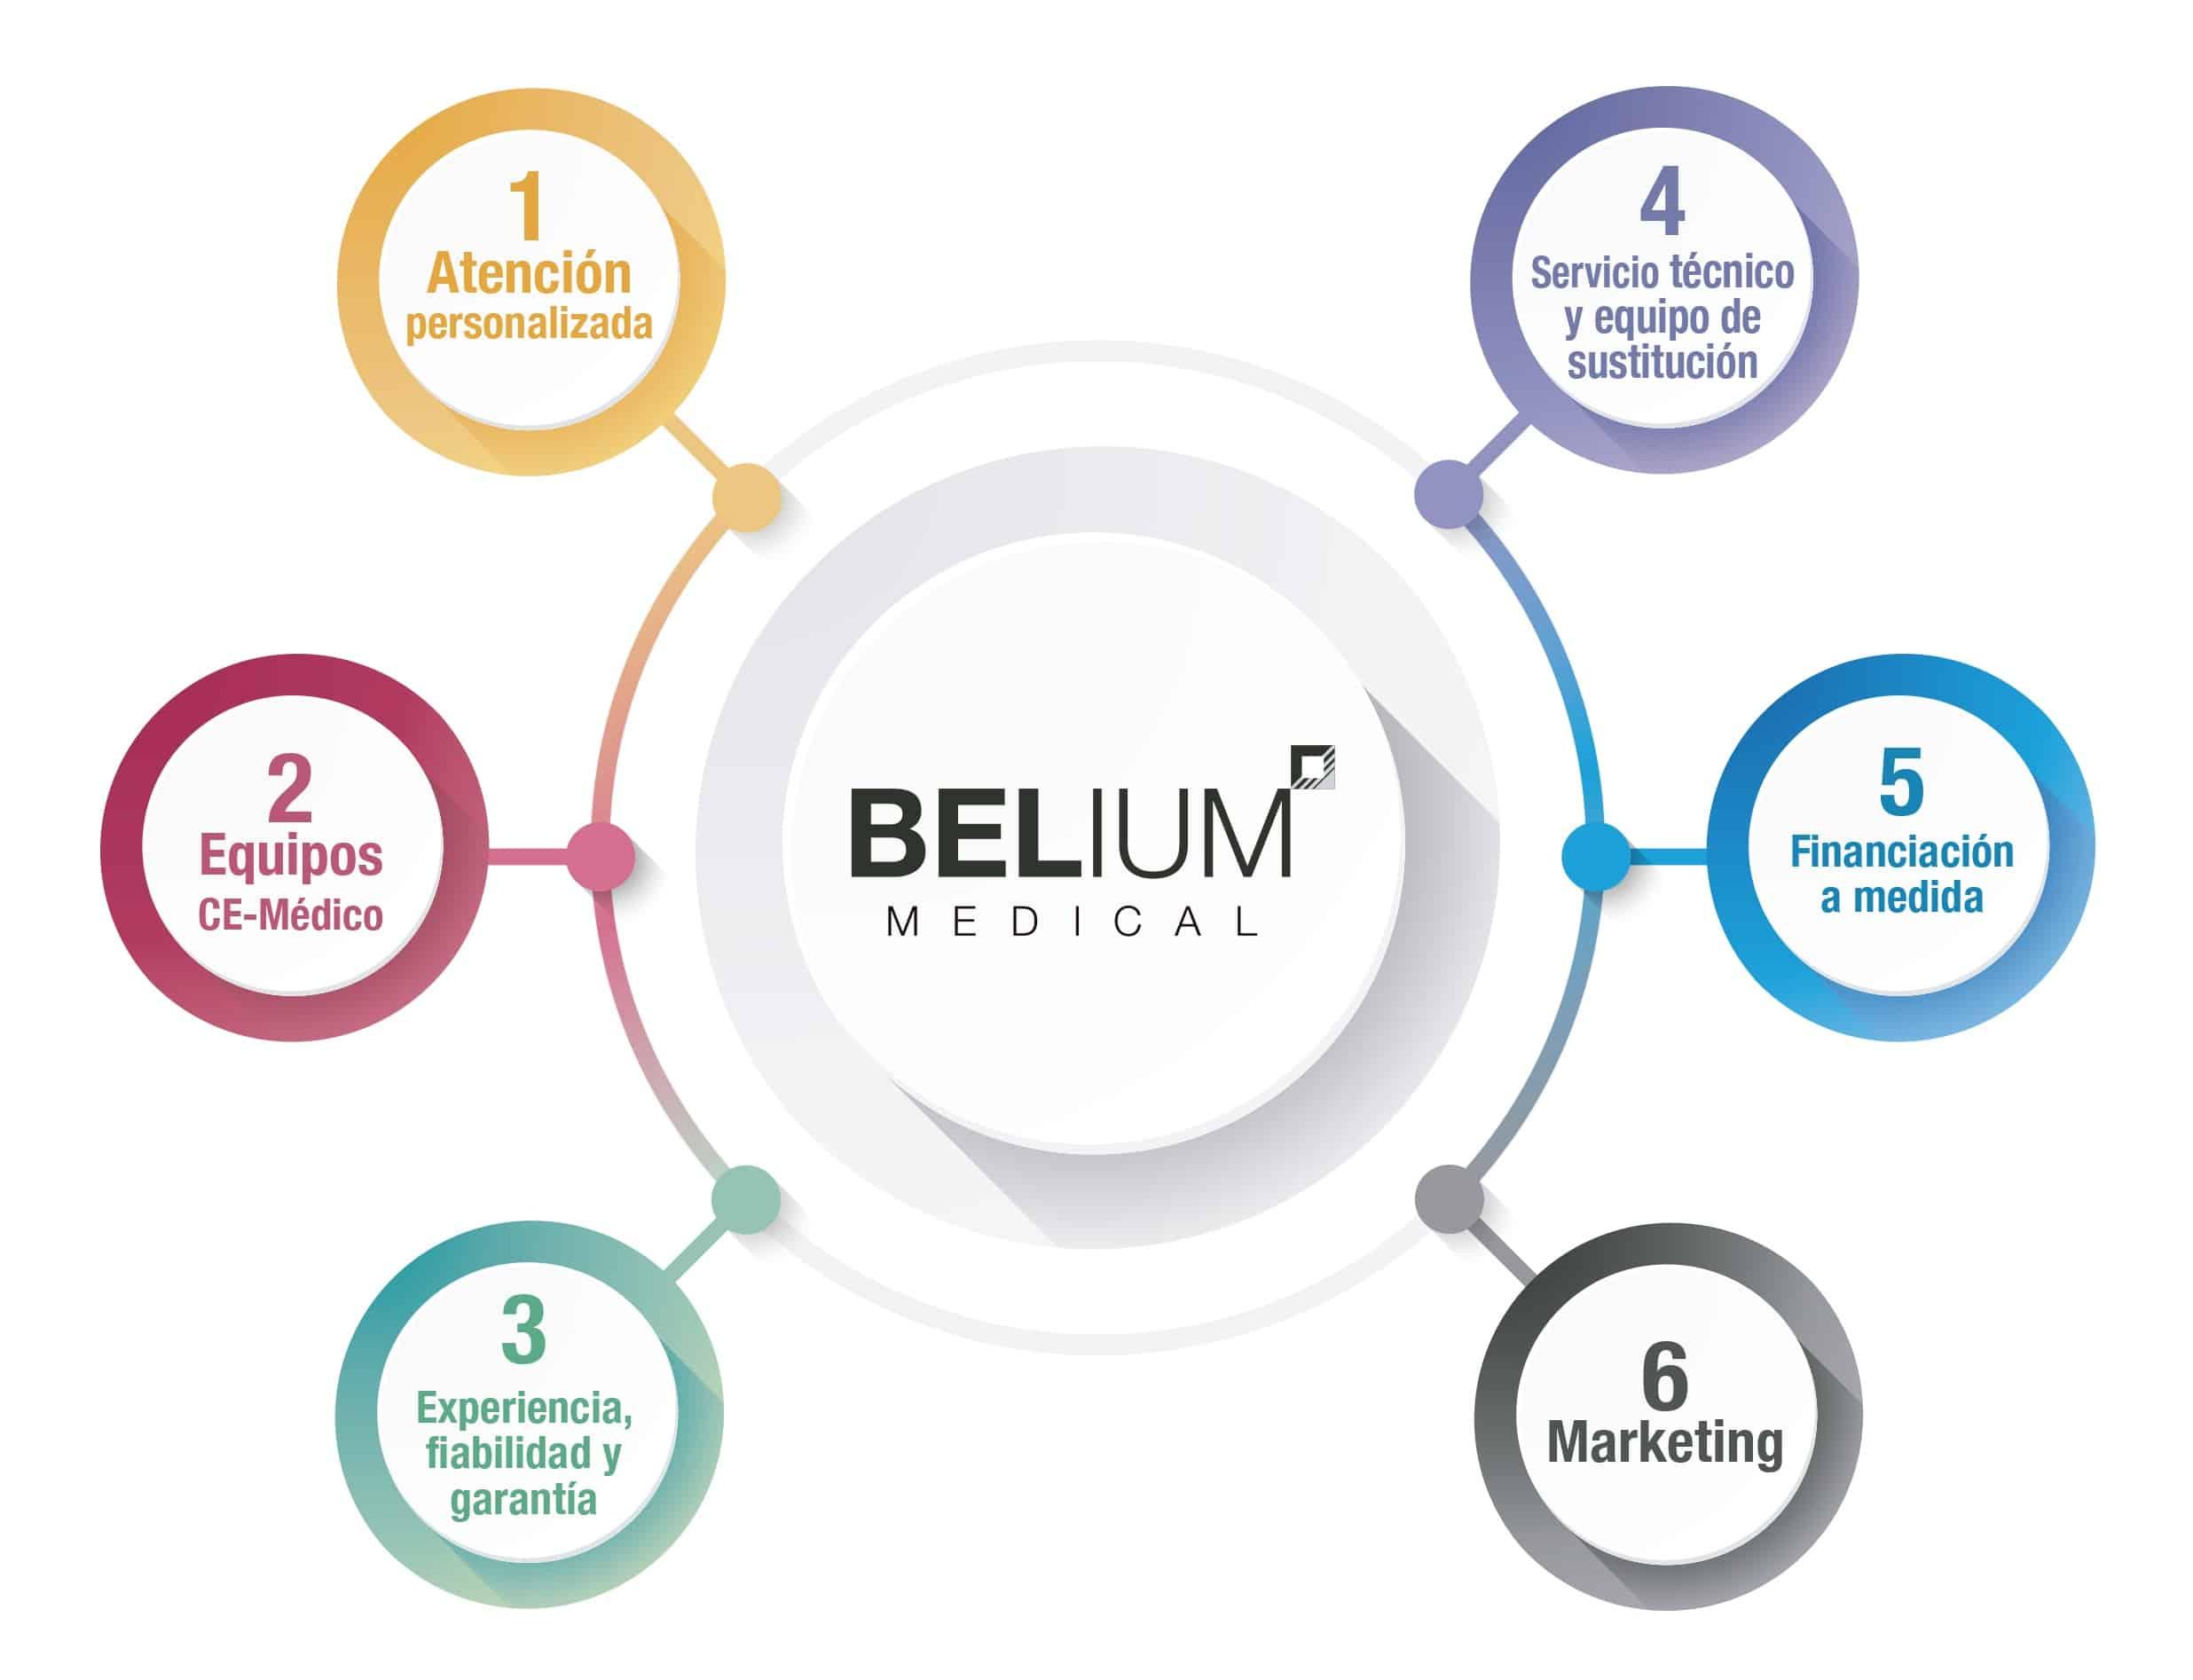 belium medical aparatología distribuidor gijon asturias medicina estetica laser belleza dermatología fisioterapia